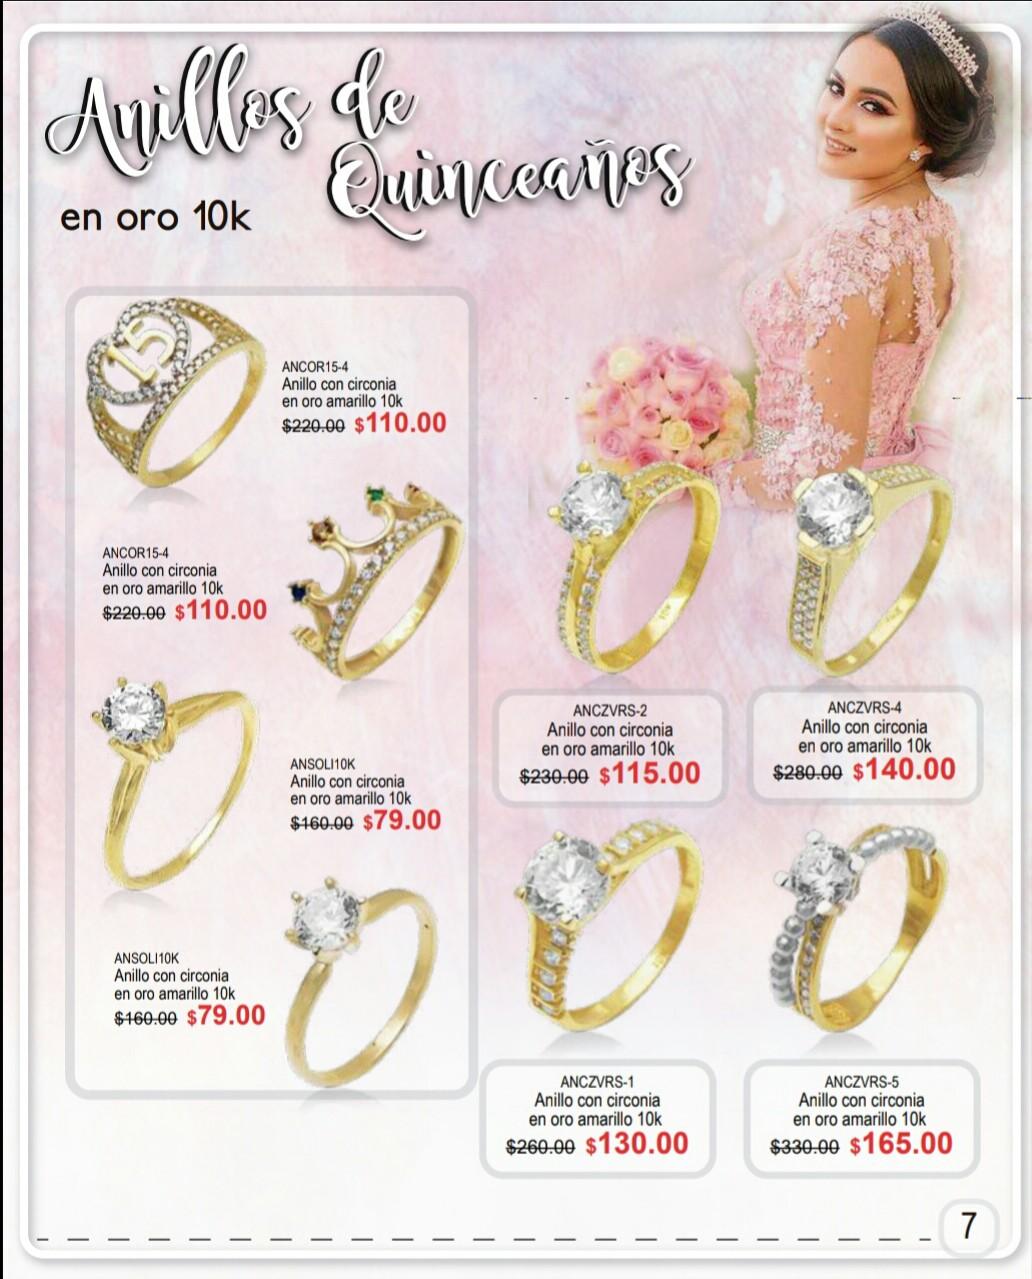 Catalogo de prendas DG Joyeros Agosto 2019 p7